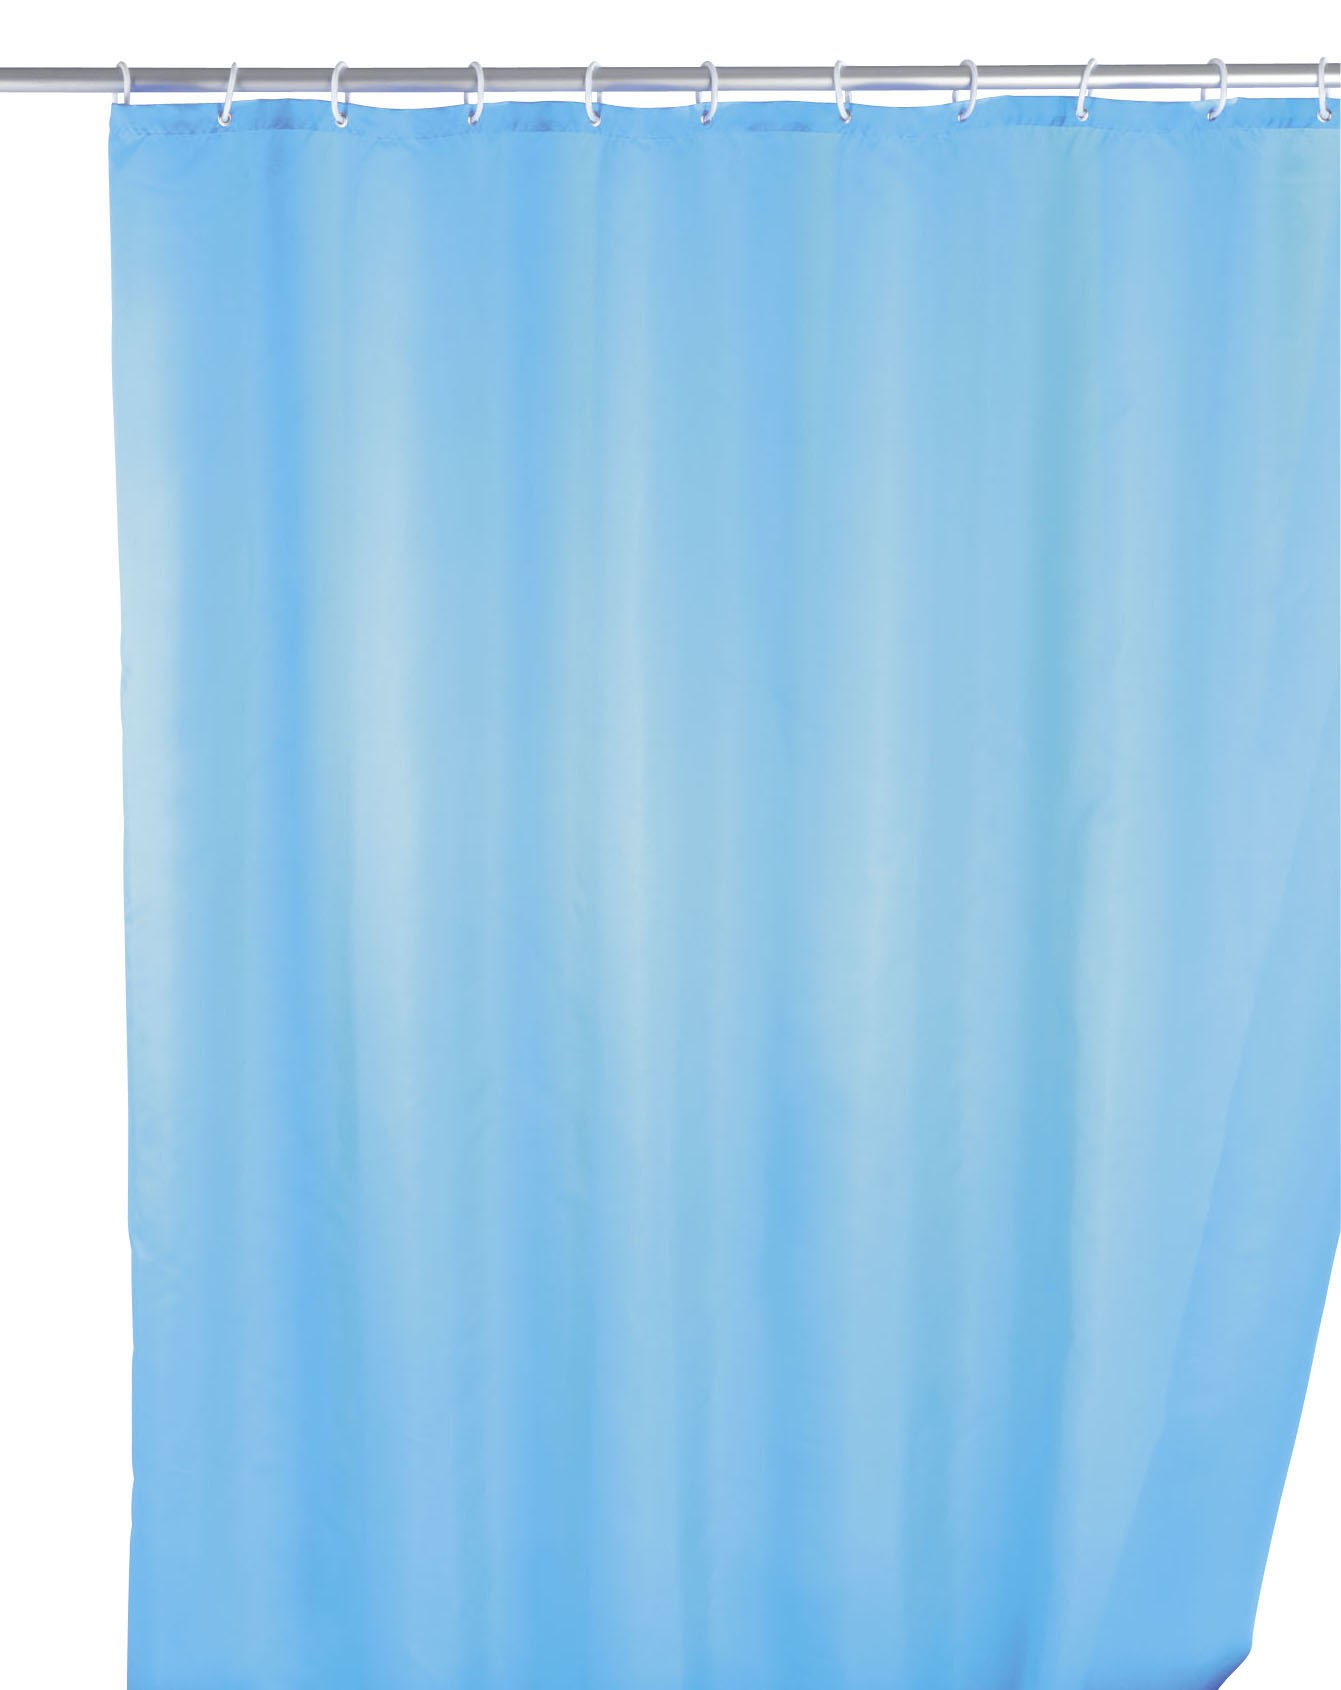 Wenko Anti-Schimmel Duschvorhang Uni Light Blue, 180 x 200 cm, waschbar